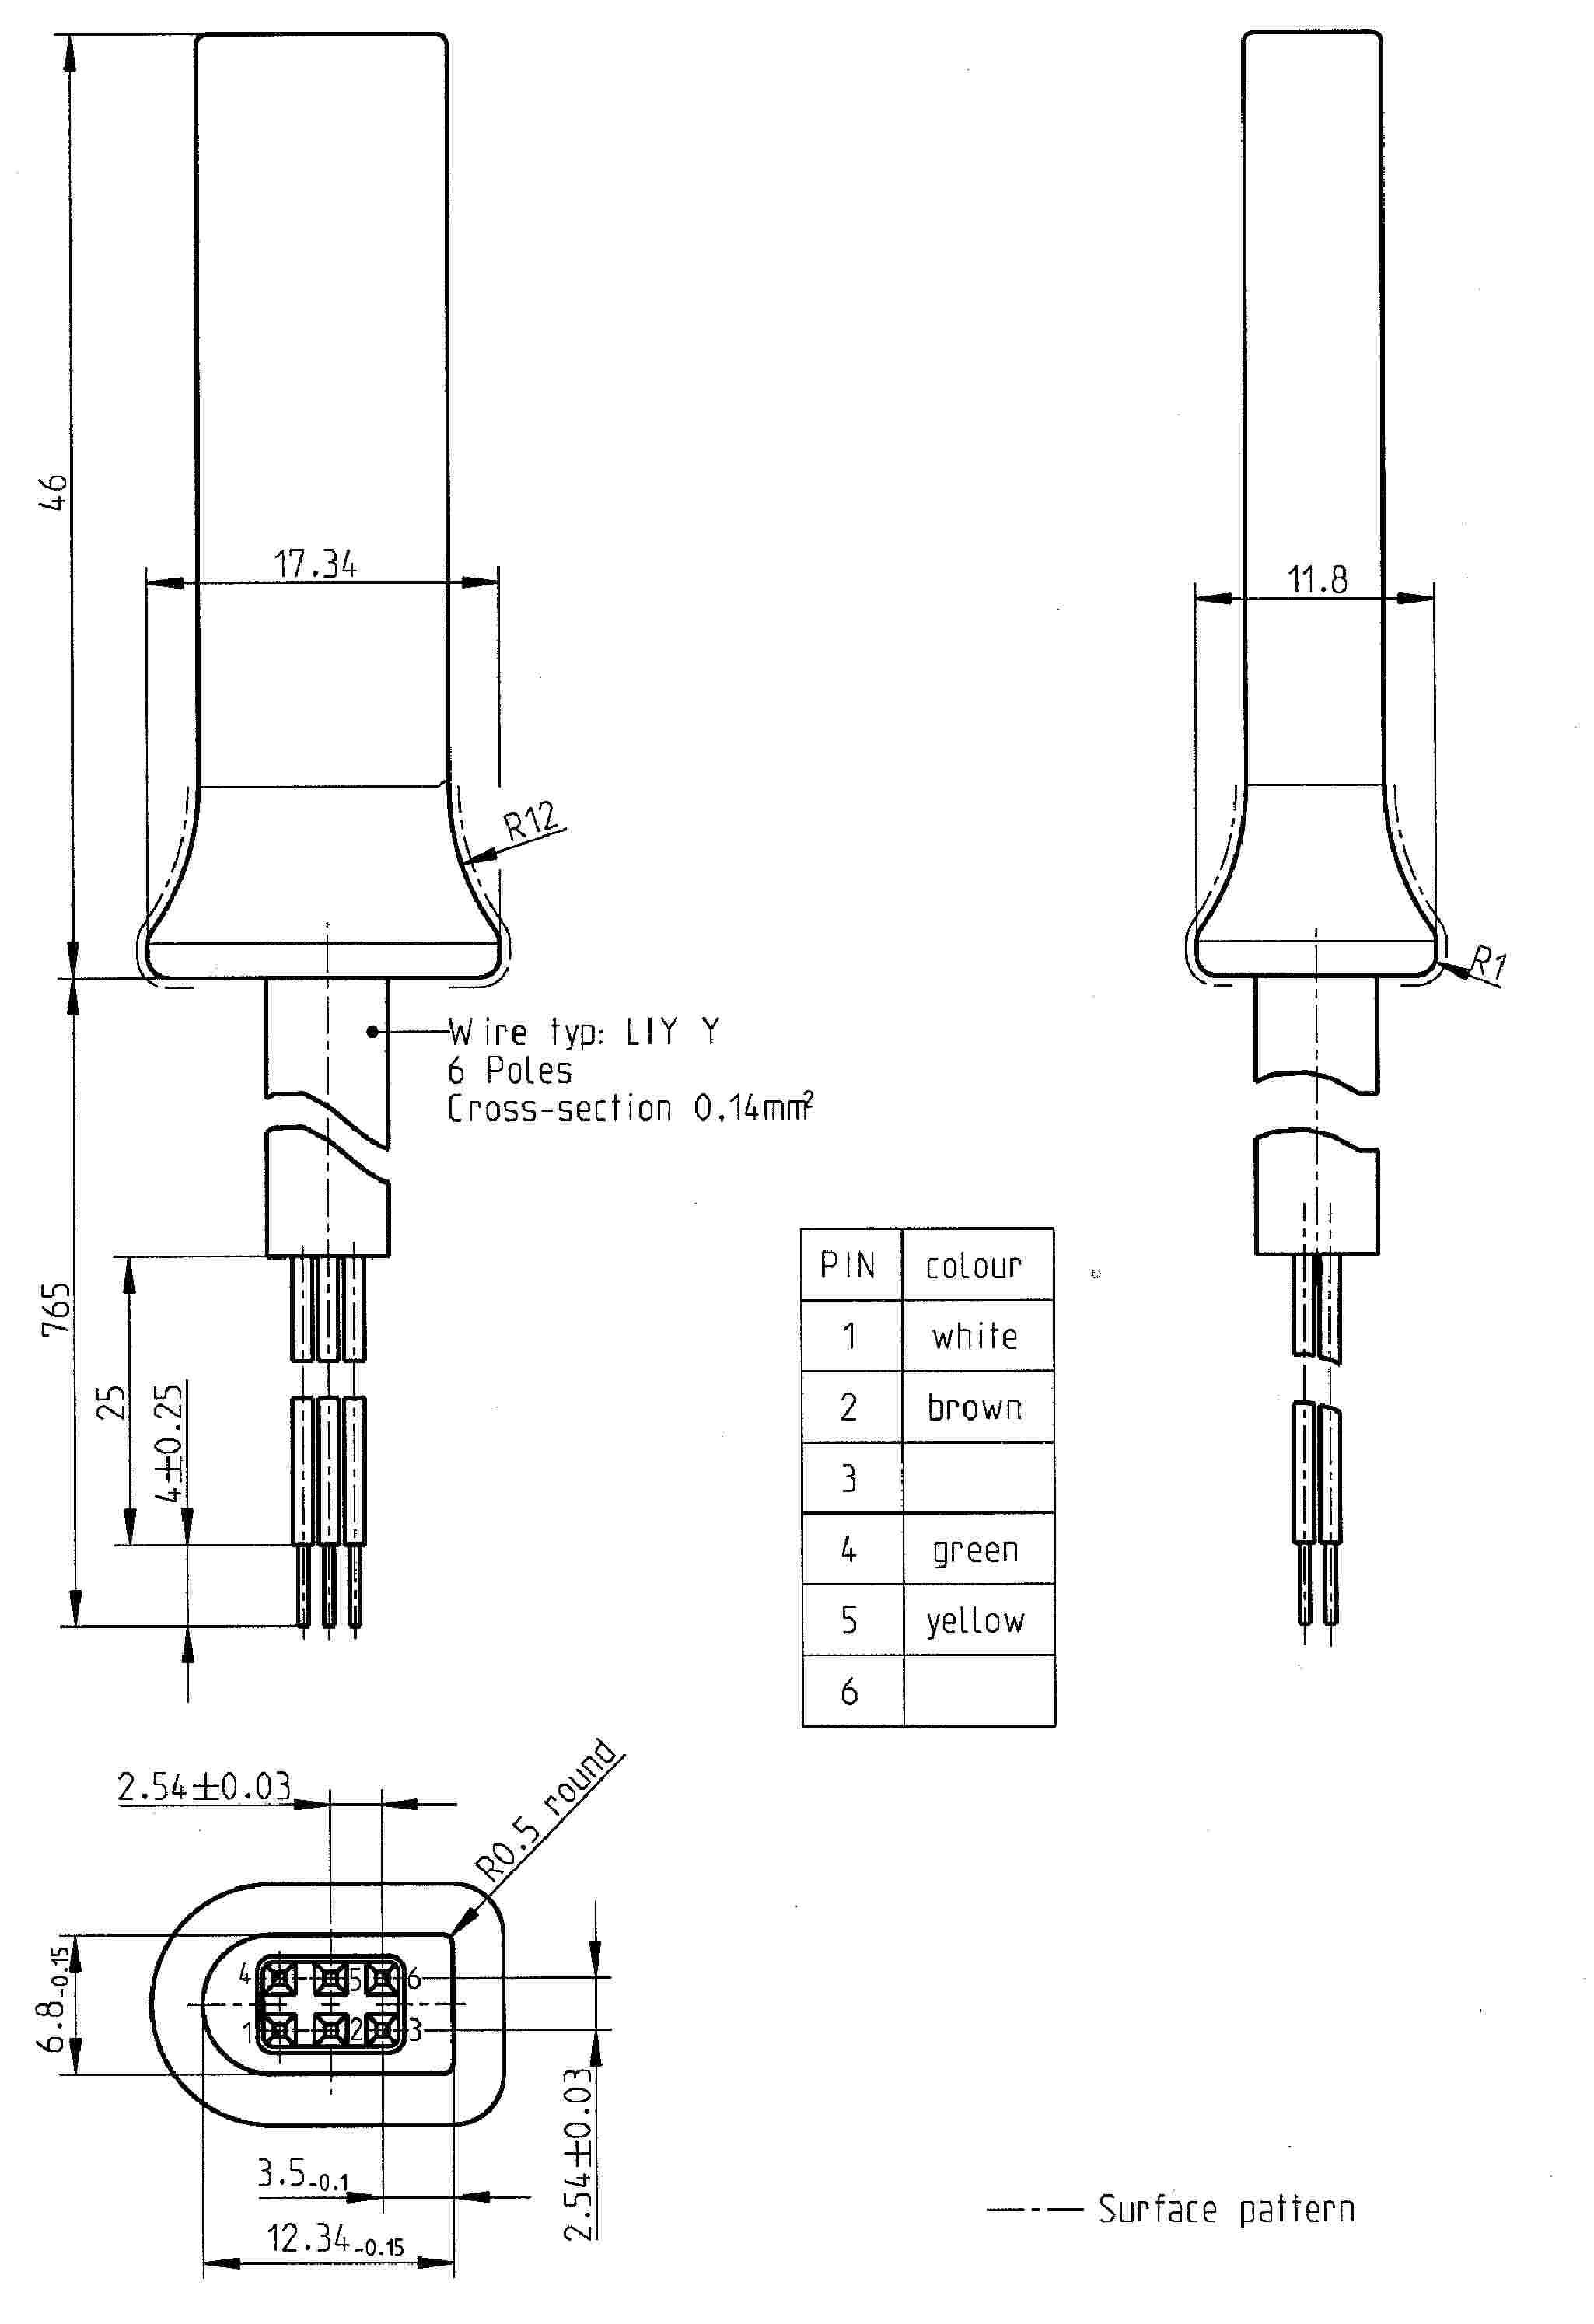 Eur Lex 01985r3821 20130701 En Diagram For Wiring 8 Pin Nr 51